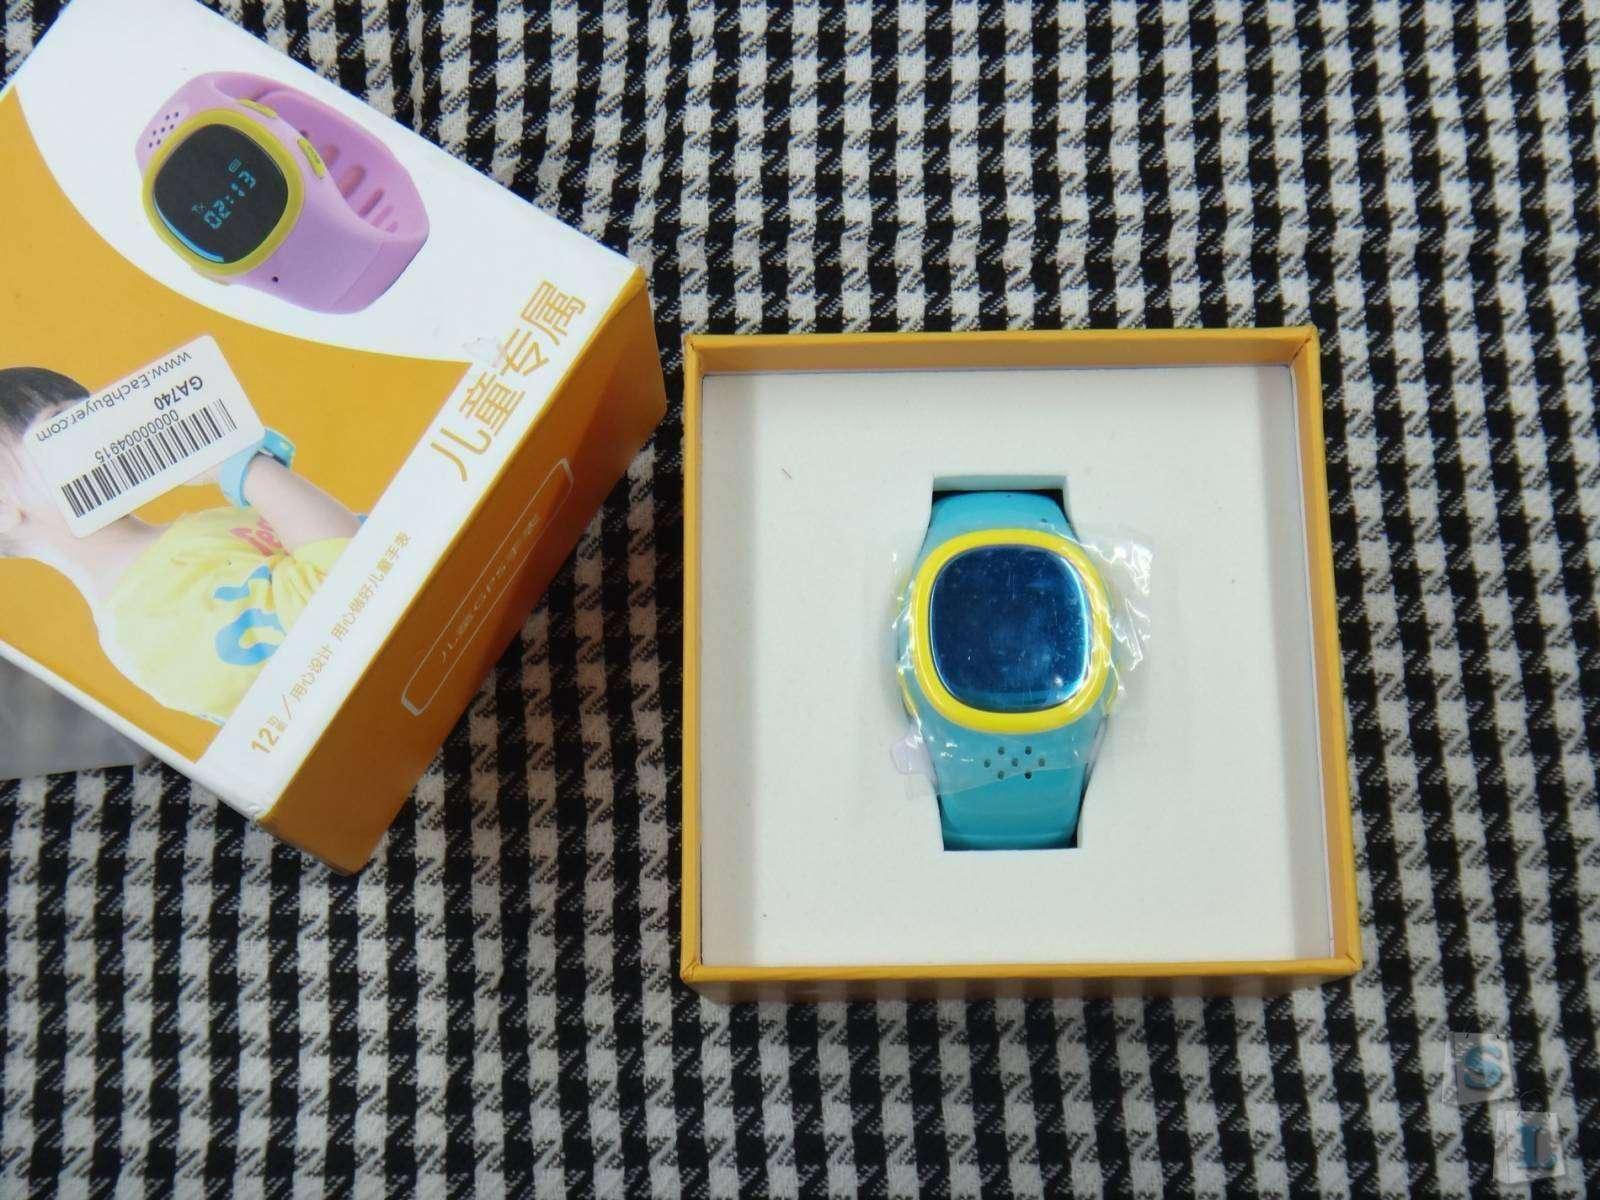 EachBuyer: Детские часы GPS трекер Cityeasy 520 с функцией телефона